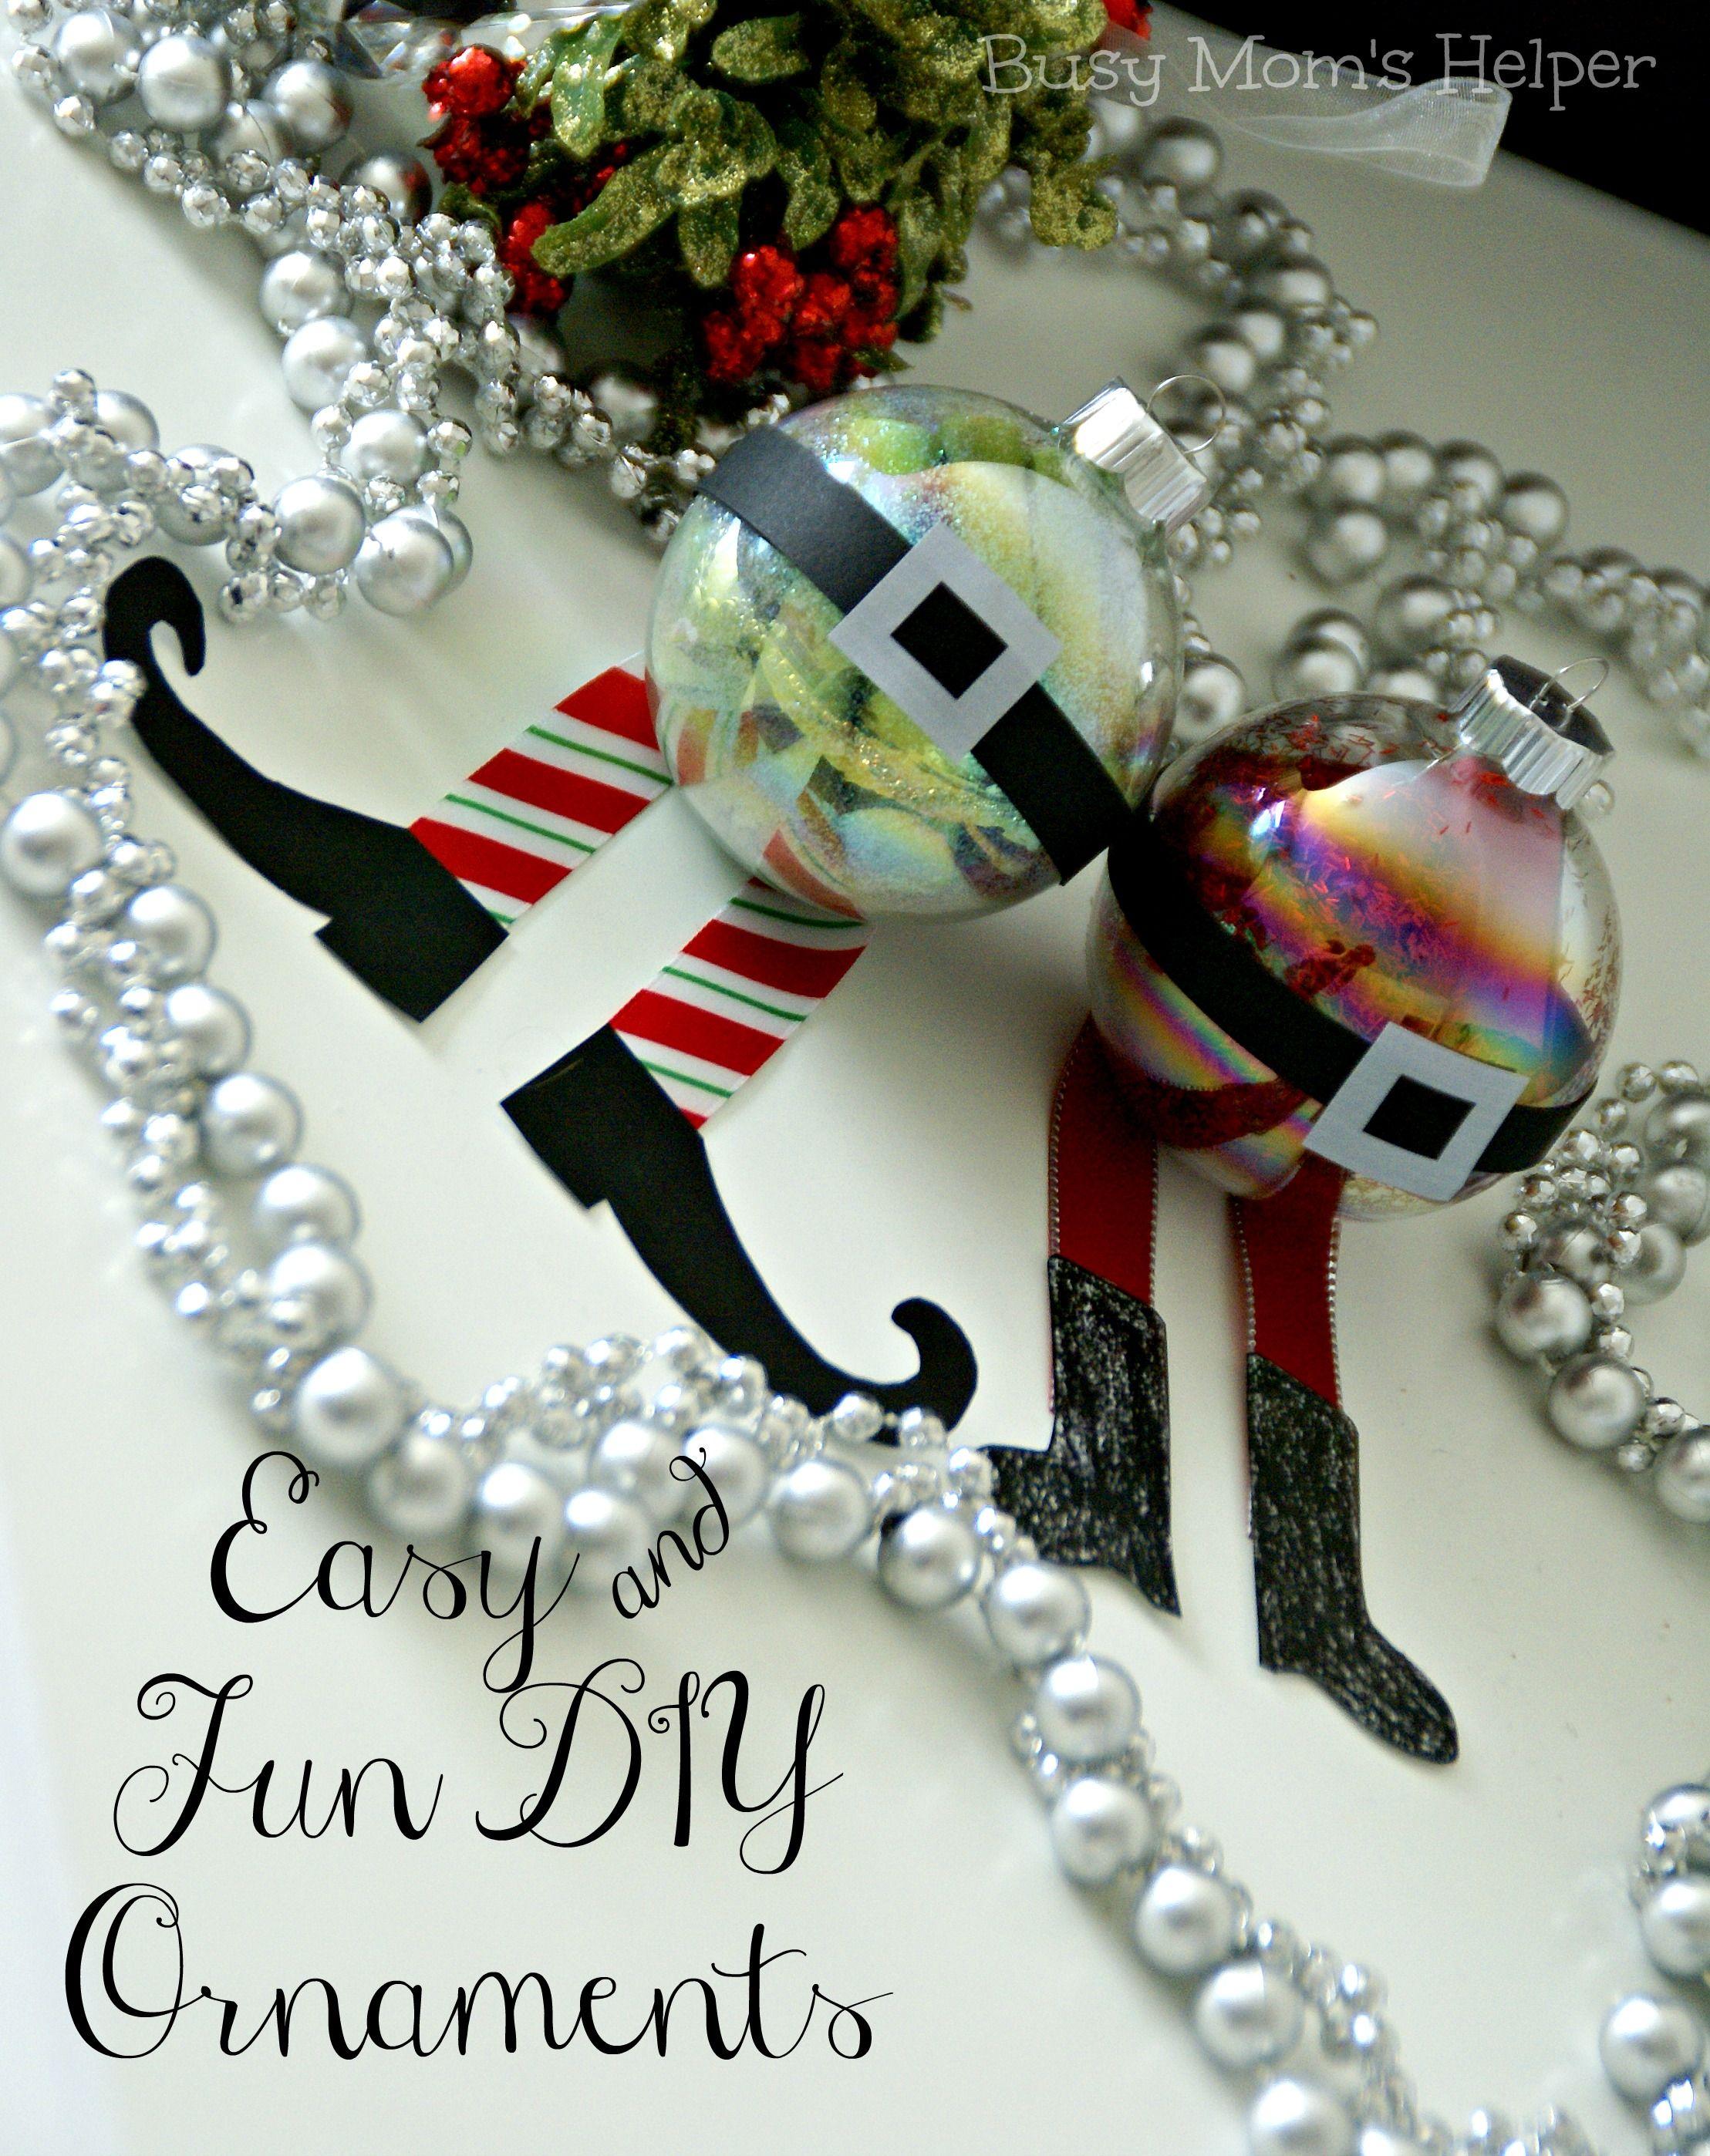 Easy and fun diy ornaments fun diy ornament and christmas ornament easy fun diy ornaments busy moms helper solutioingenieria Gallery